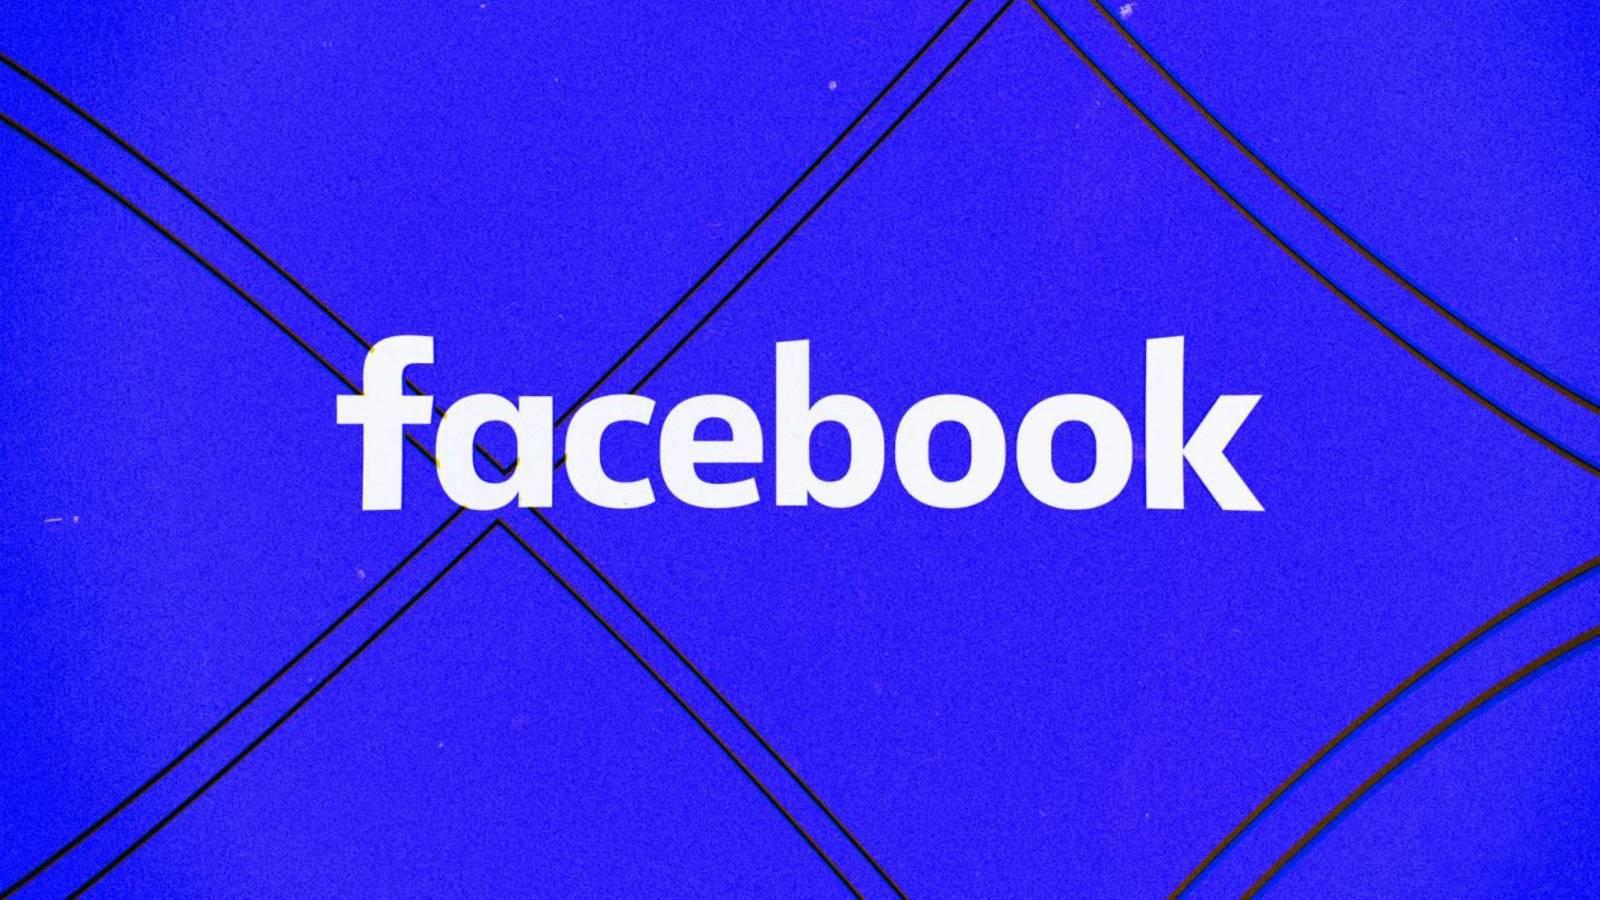 Facebook Noul Update Lansat, ce Schimbari Aduce in Telefoane